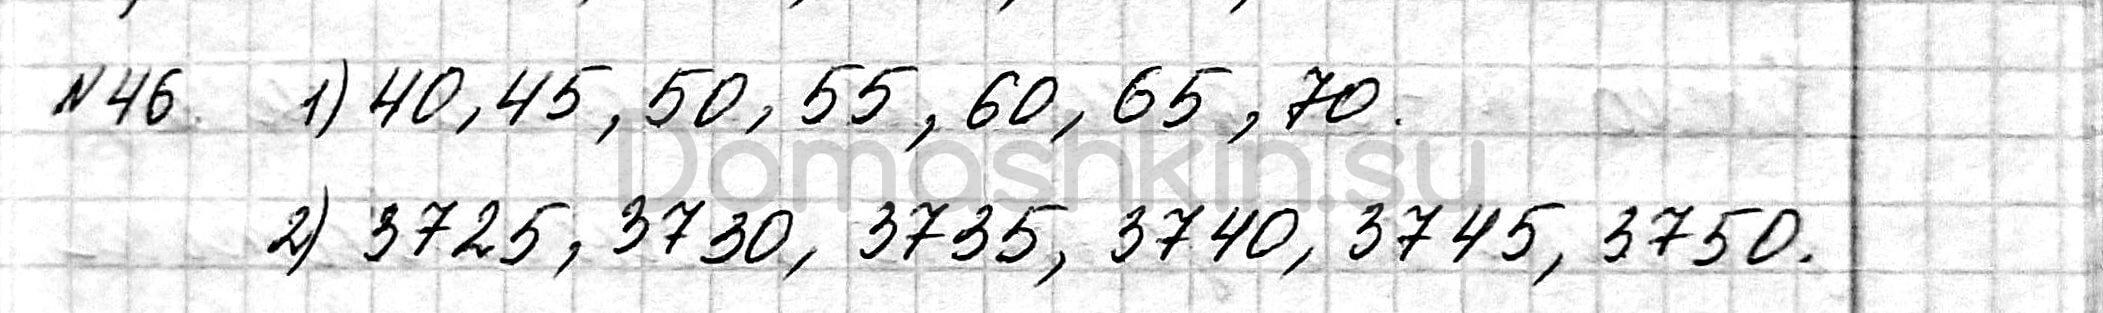 Математика 6 класс учебник Мерзляк номер 46 решение